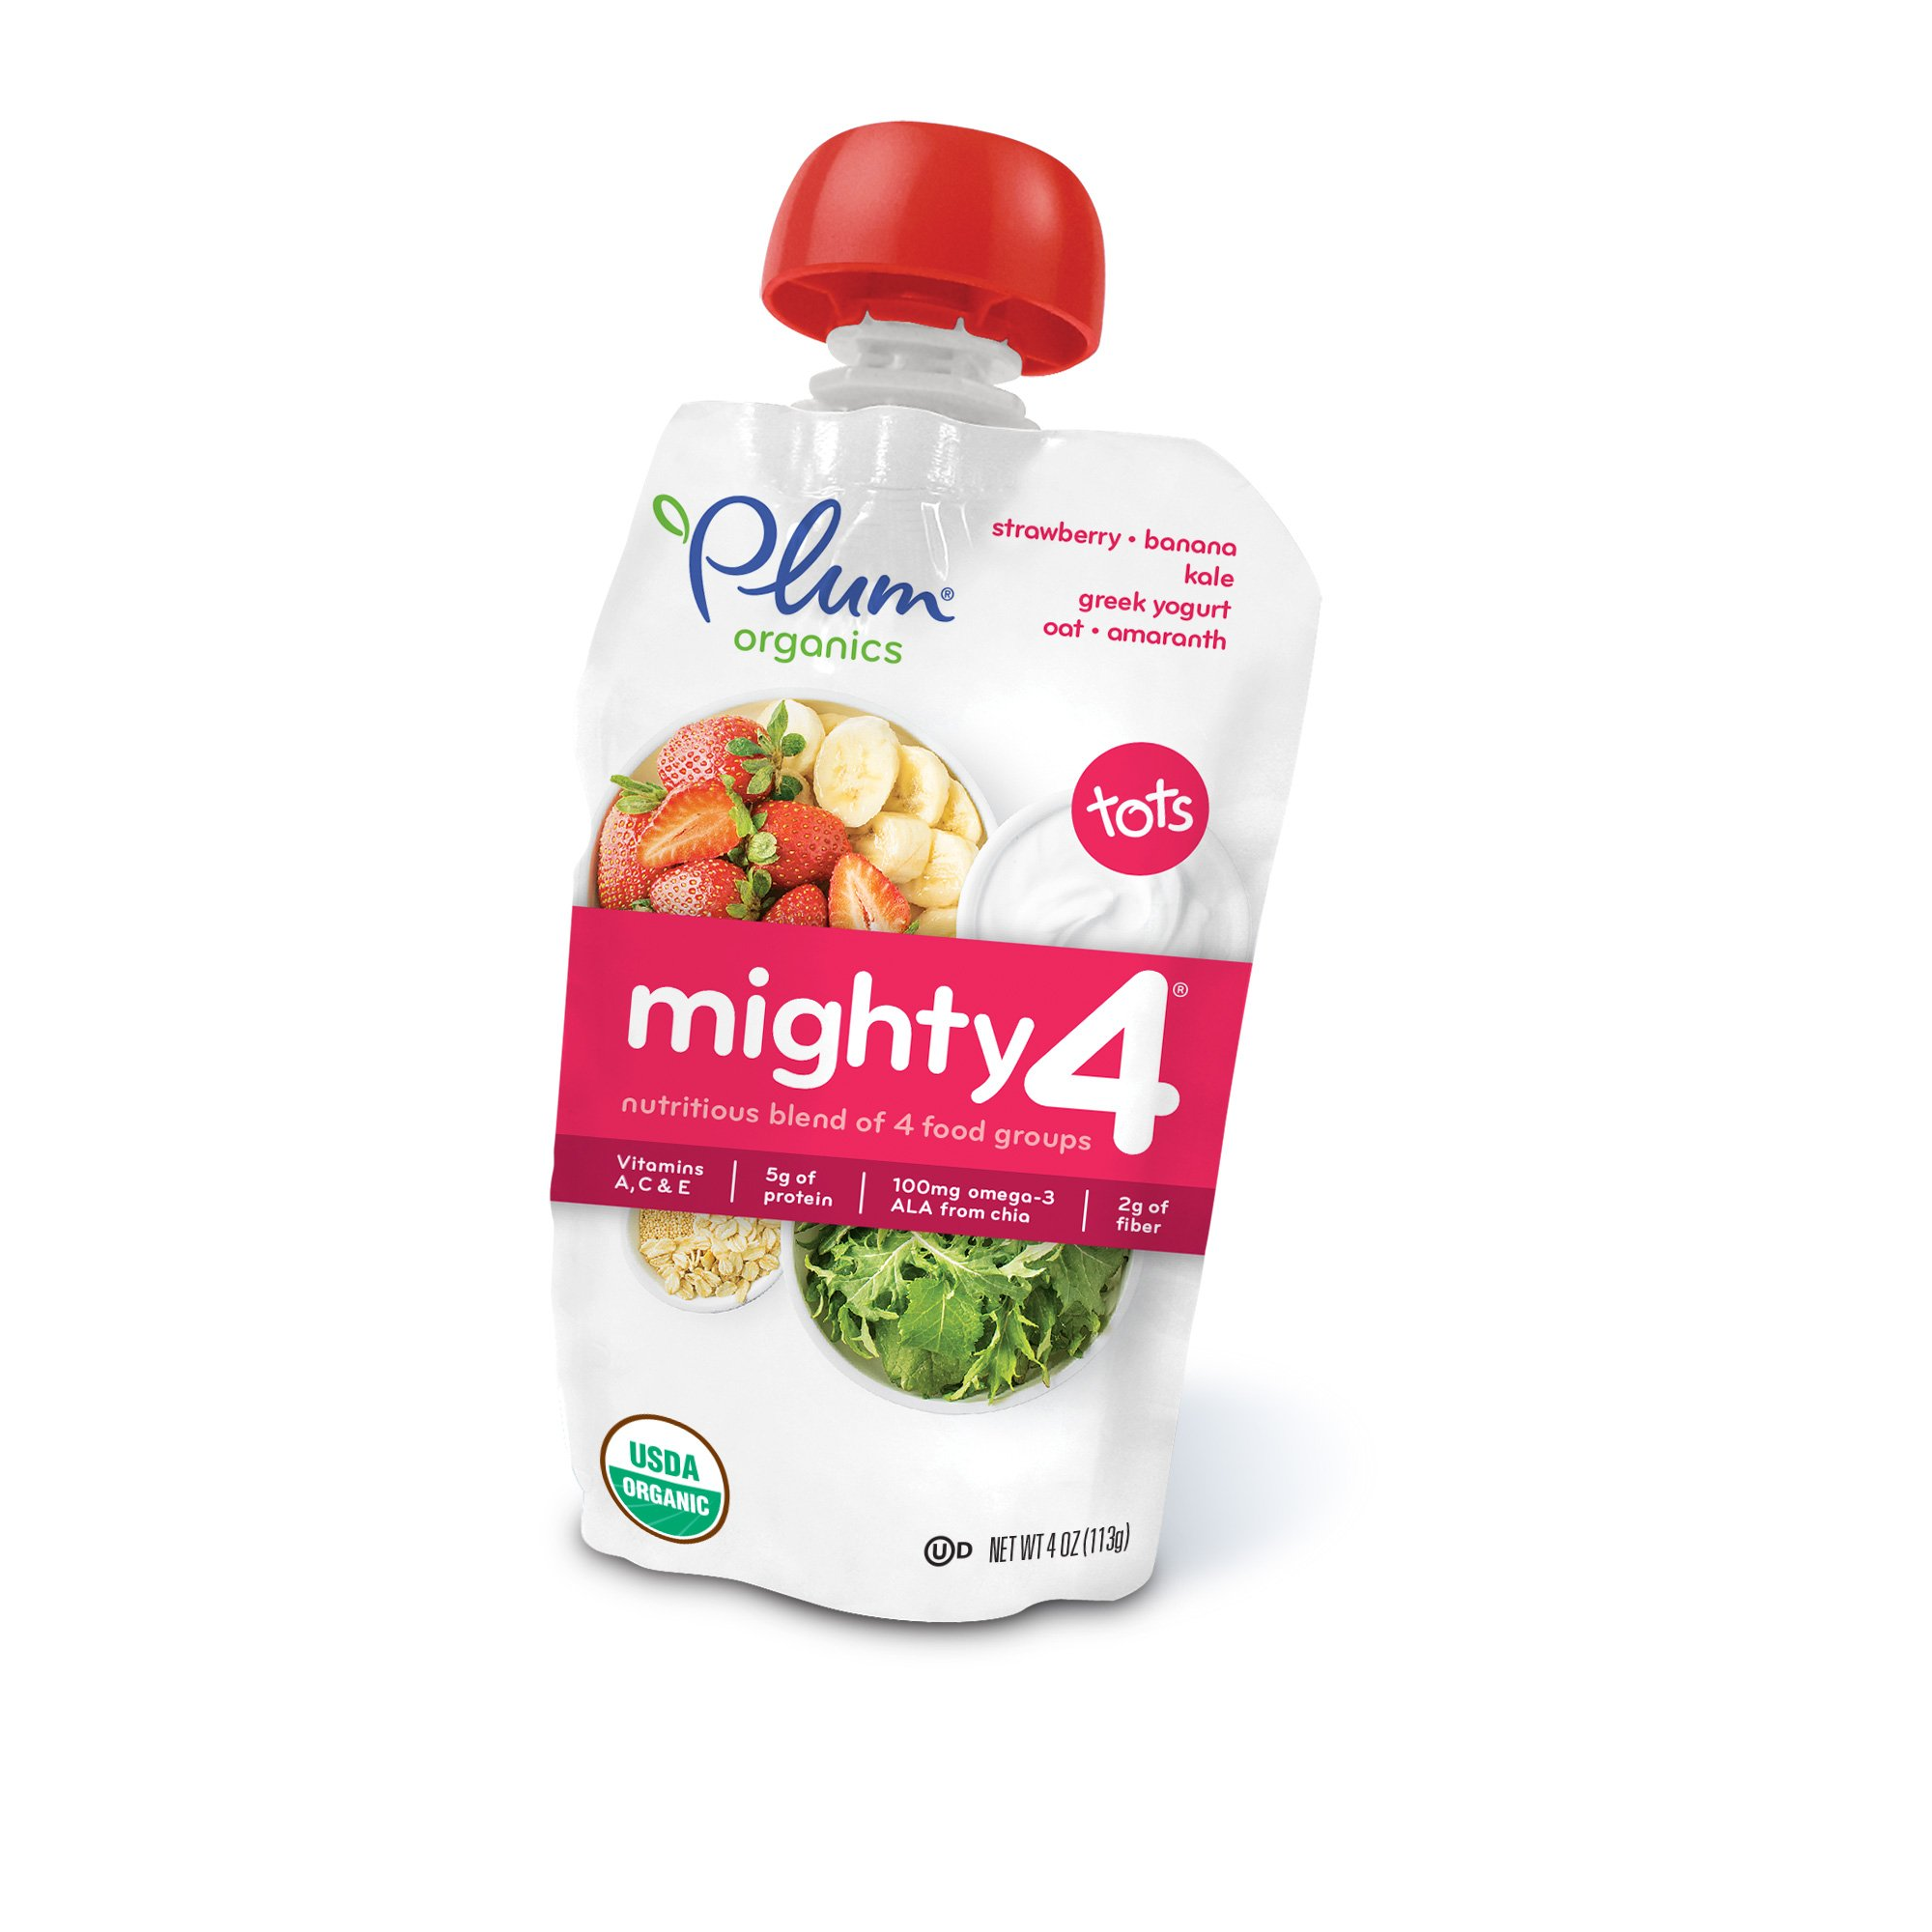 Plum Organics Mighty 4, Organic Toddler Food, Strawberry, Banana, Kale, Greek Yogurt, Oat and Amaranth, 4 oz